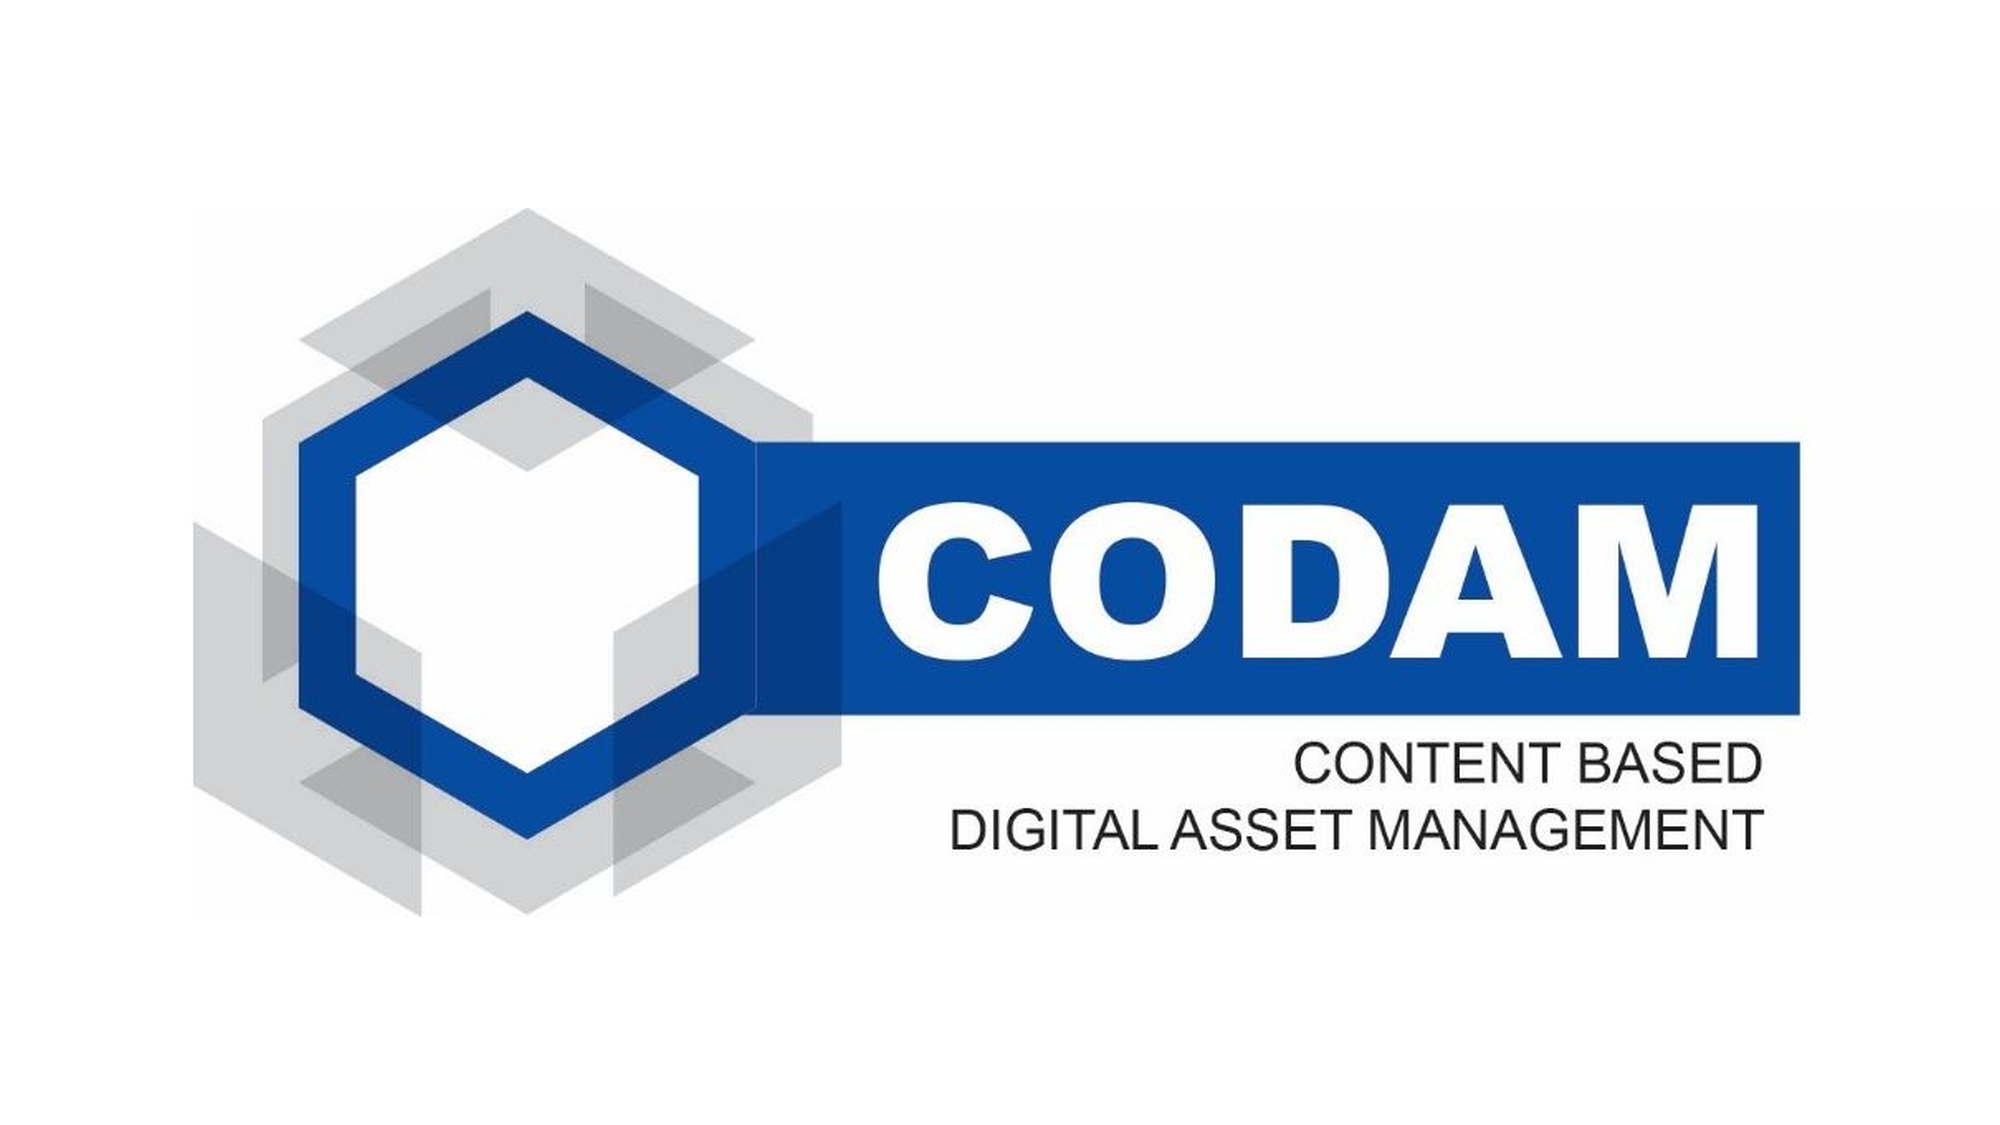 CODAM-logo-news.png